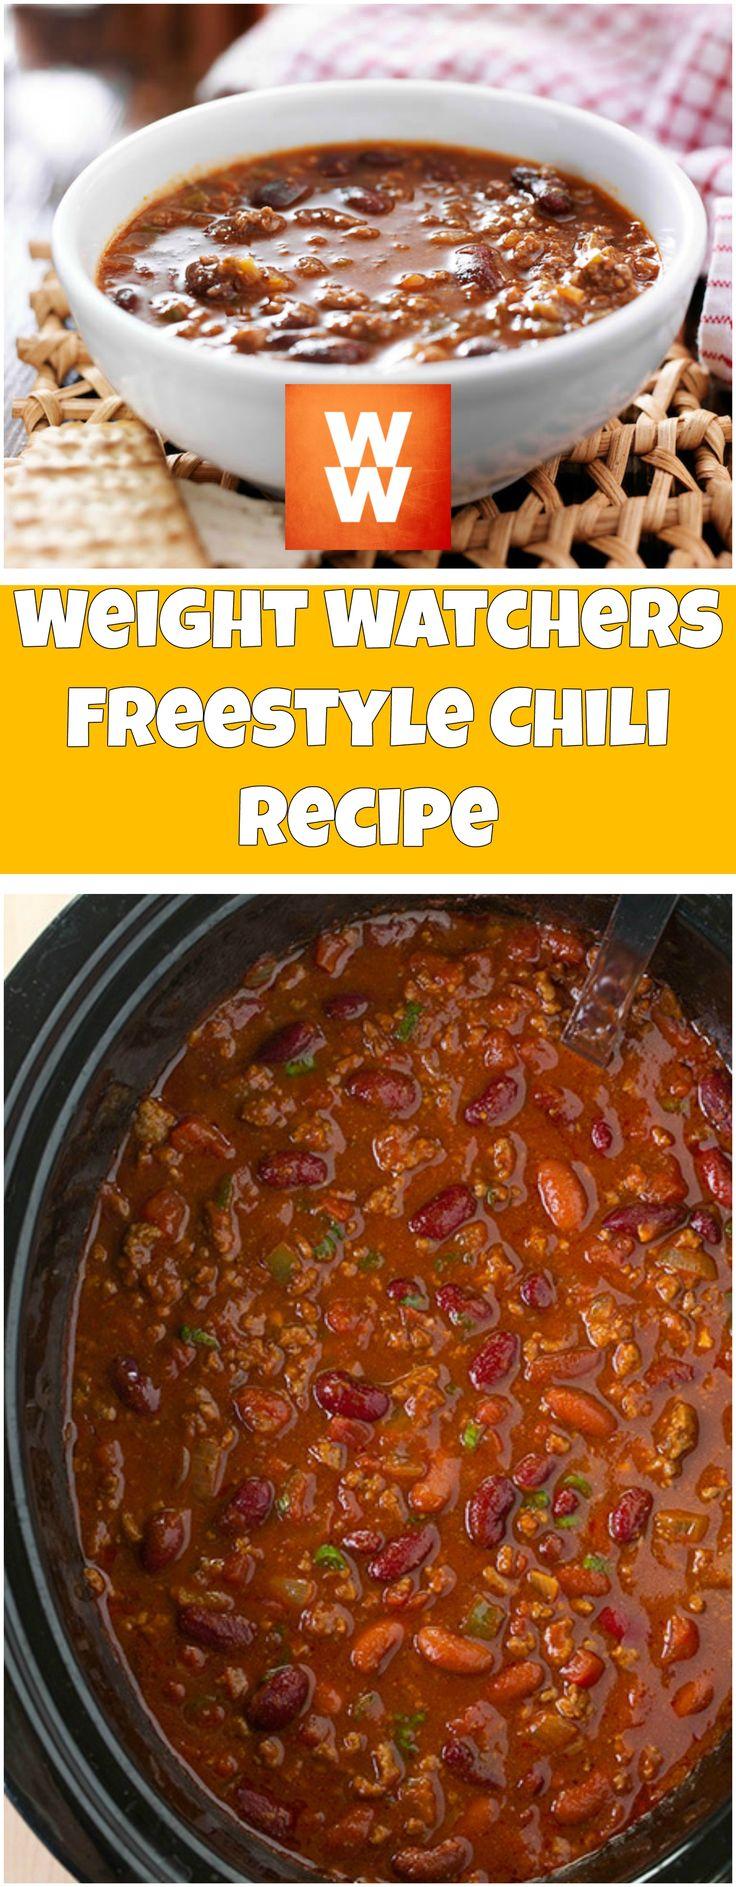 Weight Watchers Freestyle Chili Recipe | weight watchers cooking